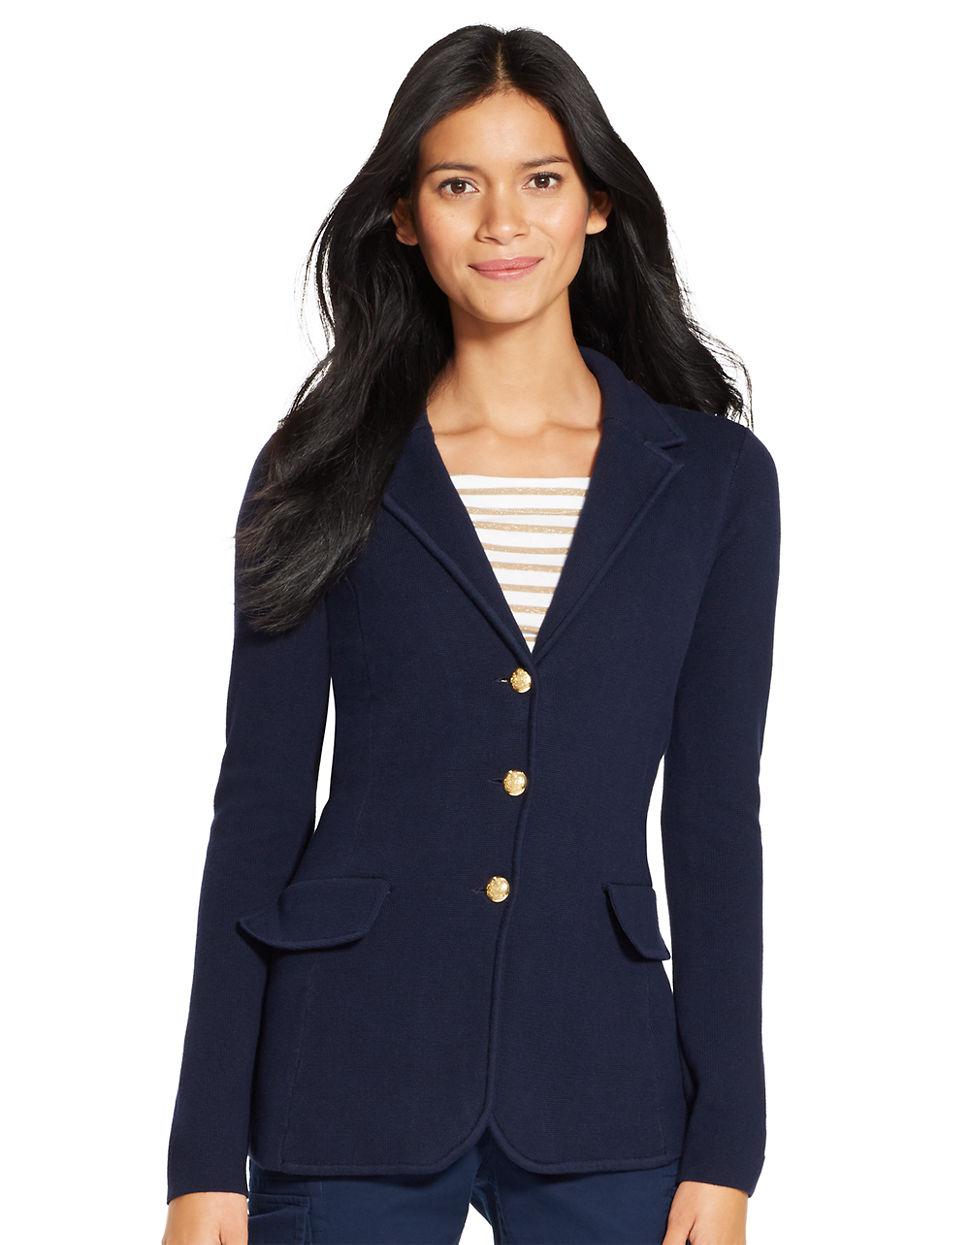 lauren by ralph lauren cotton sweater blazer in blue regal navy lyst. Black Bedroom Furniture Sets. Home Design Ideas